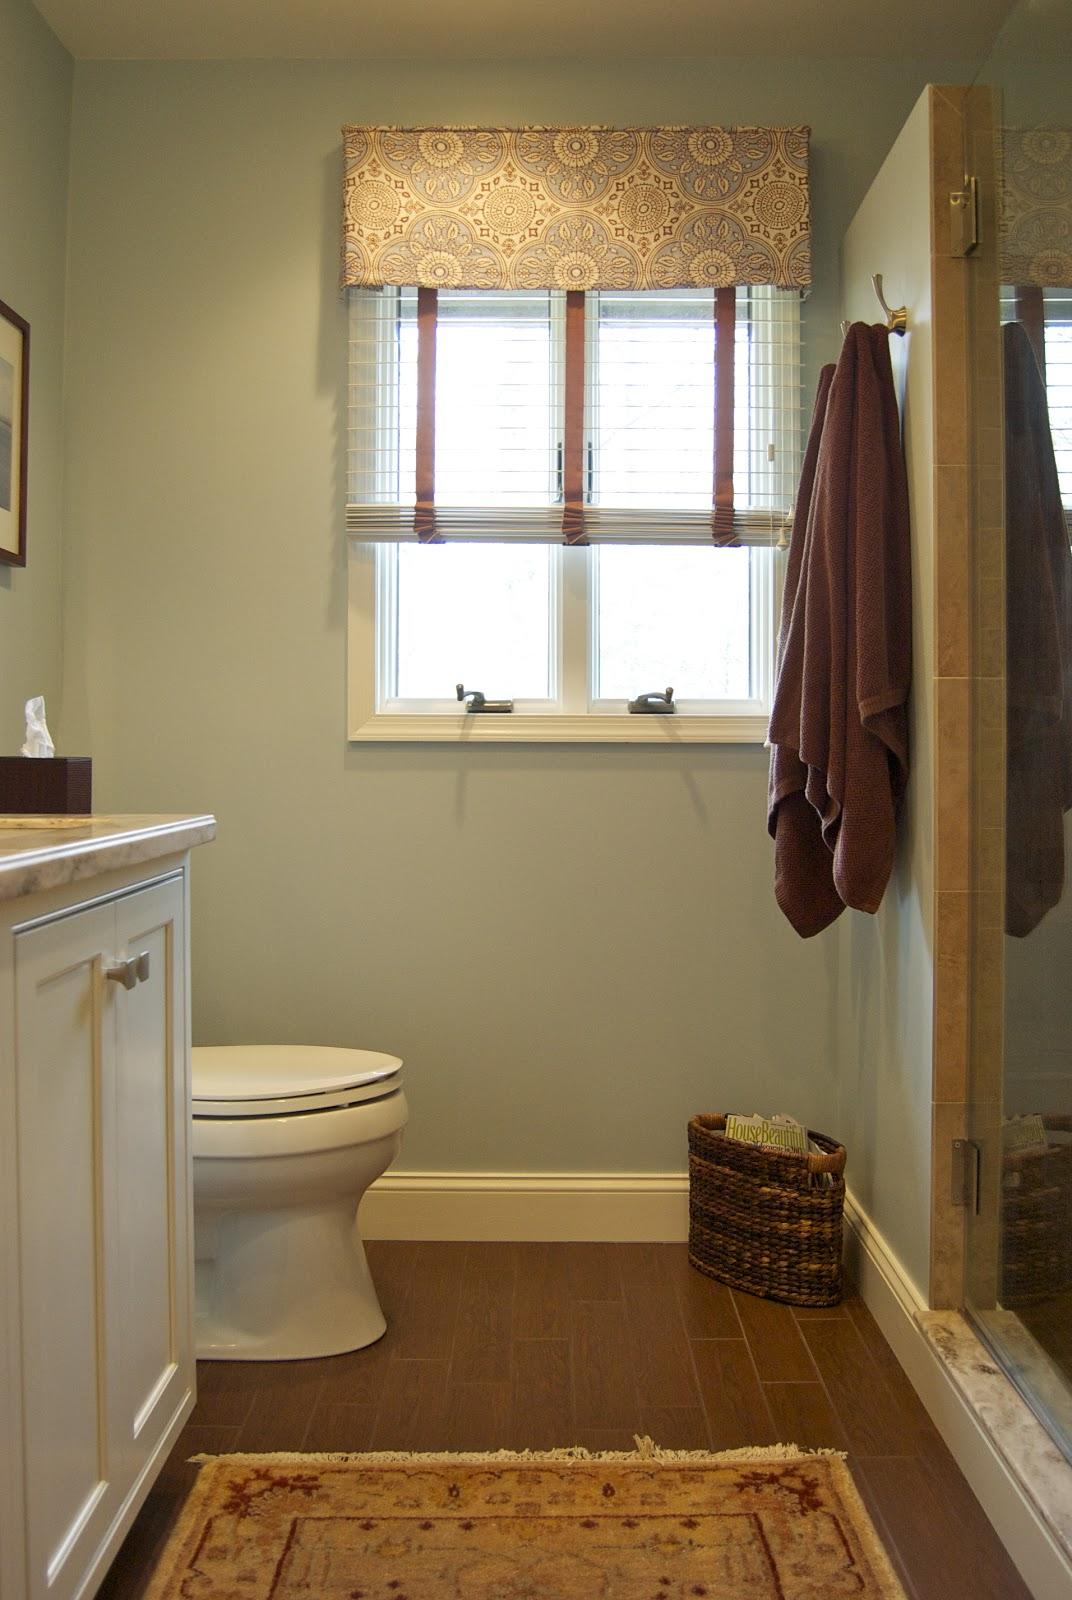 Pretty Inspirational: Recent Project: Master Bathroom ... on Restroom Renovation  id=63059